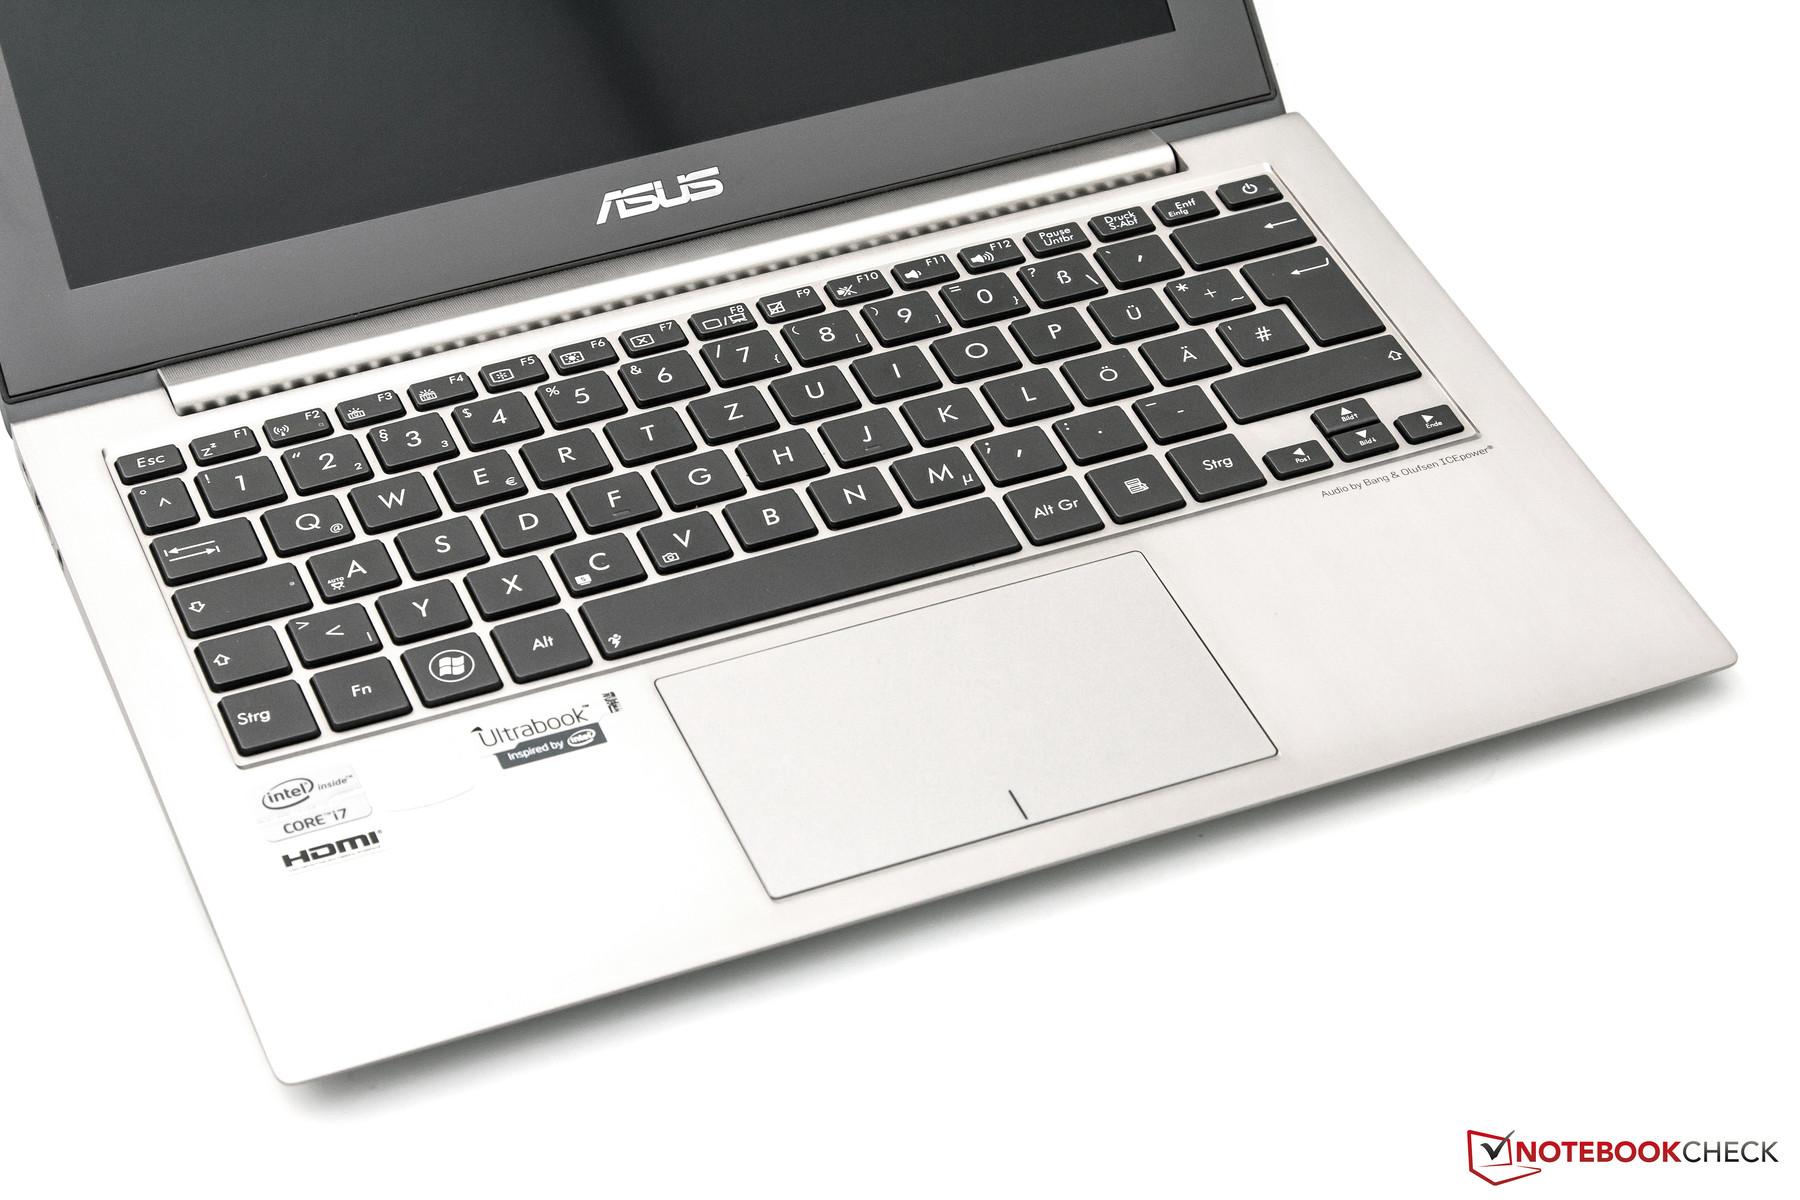 Review Asus Zenbook Prime UX21A Ultrabook - NotebookCheck.net Reviews